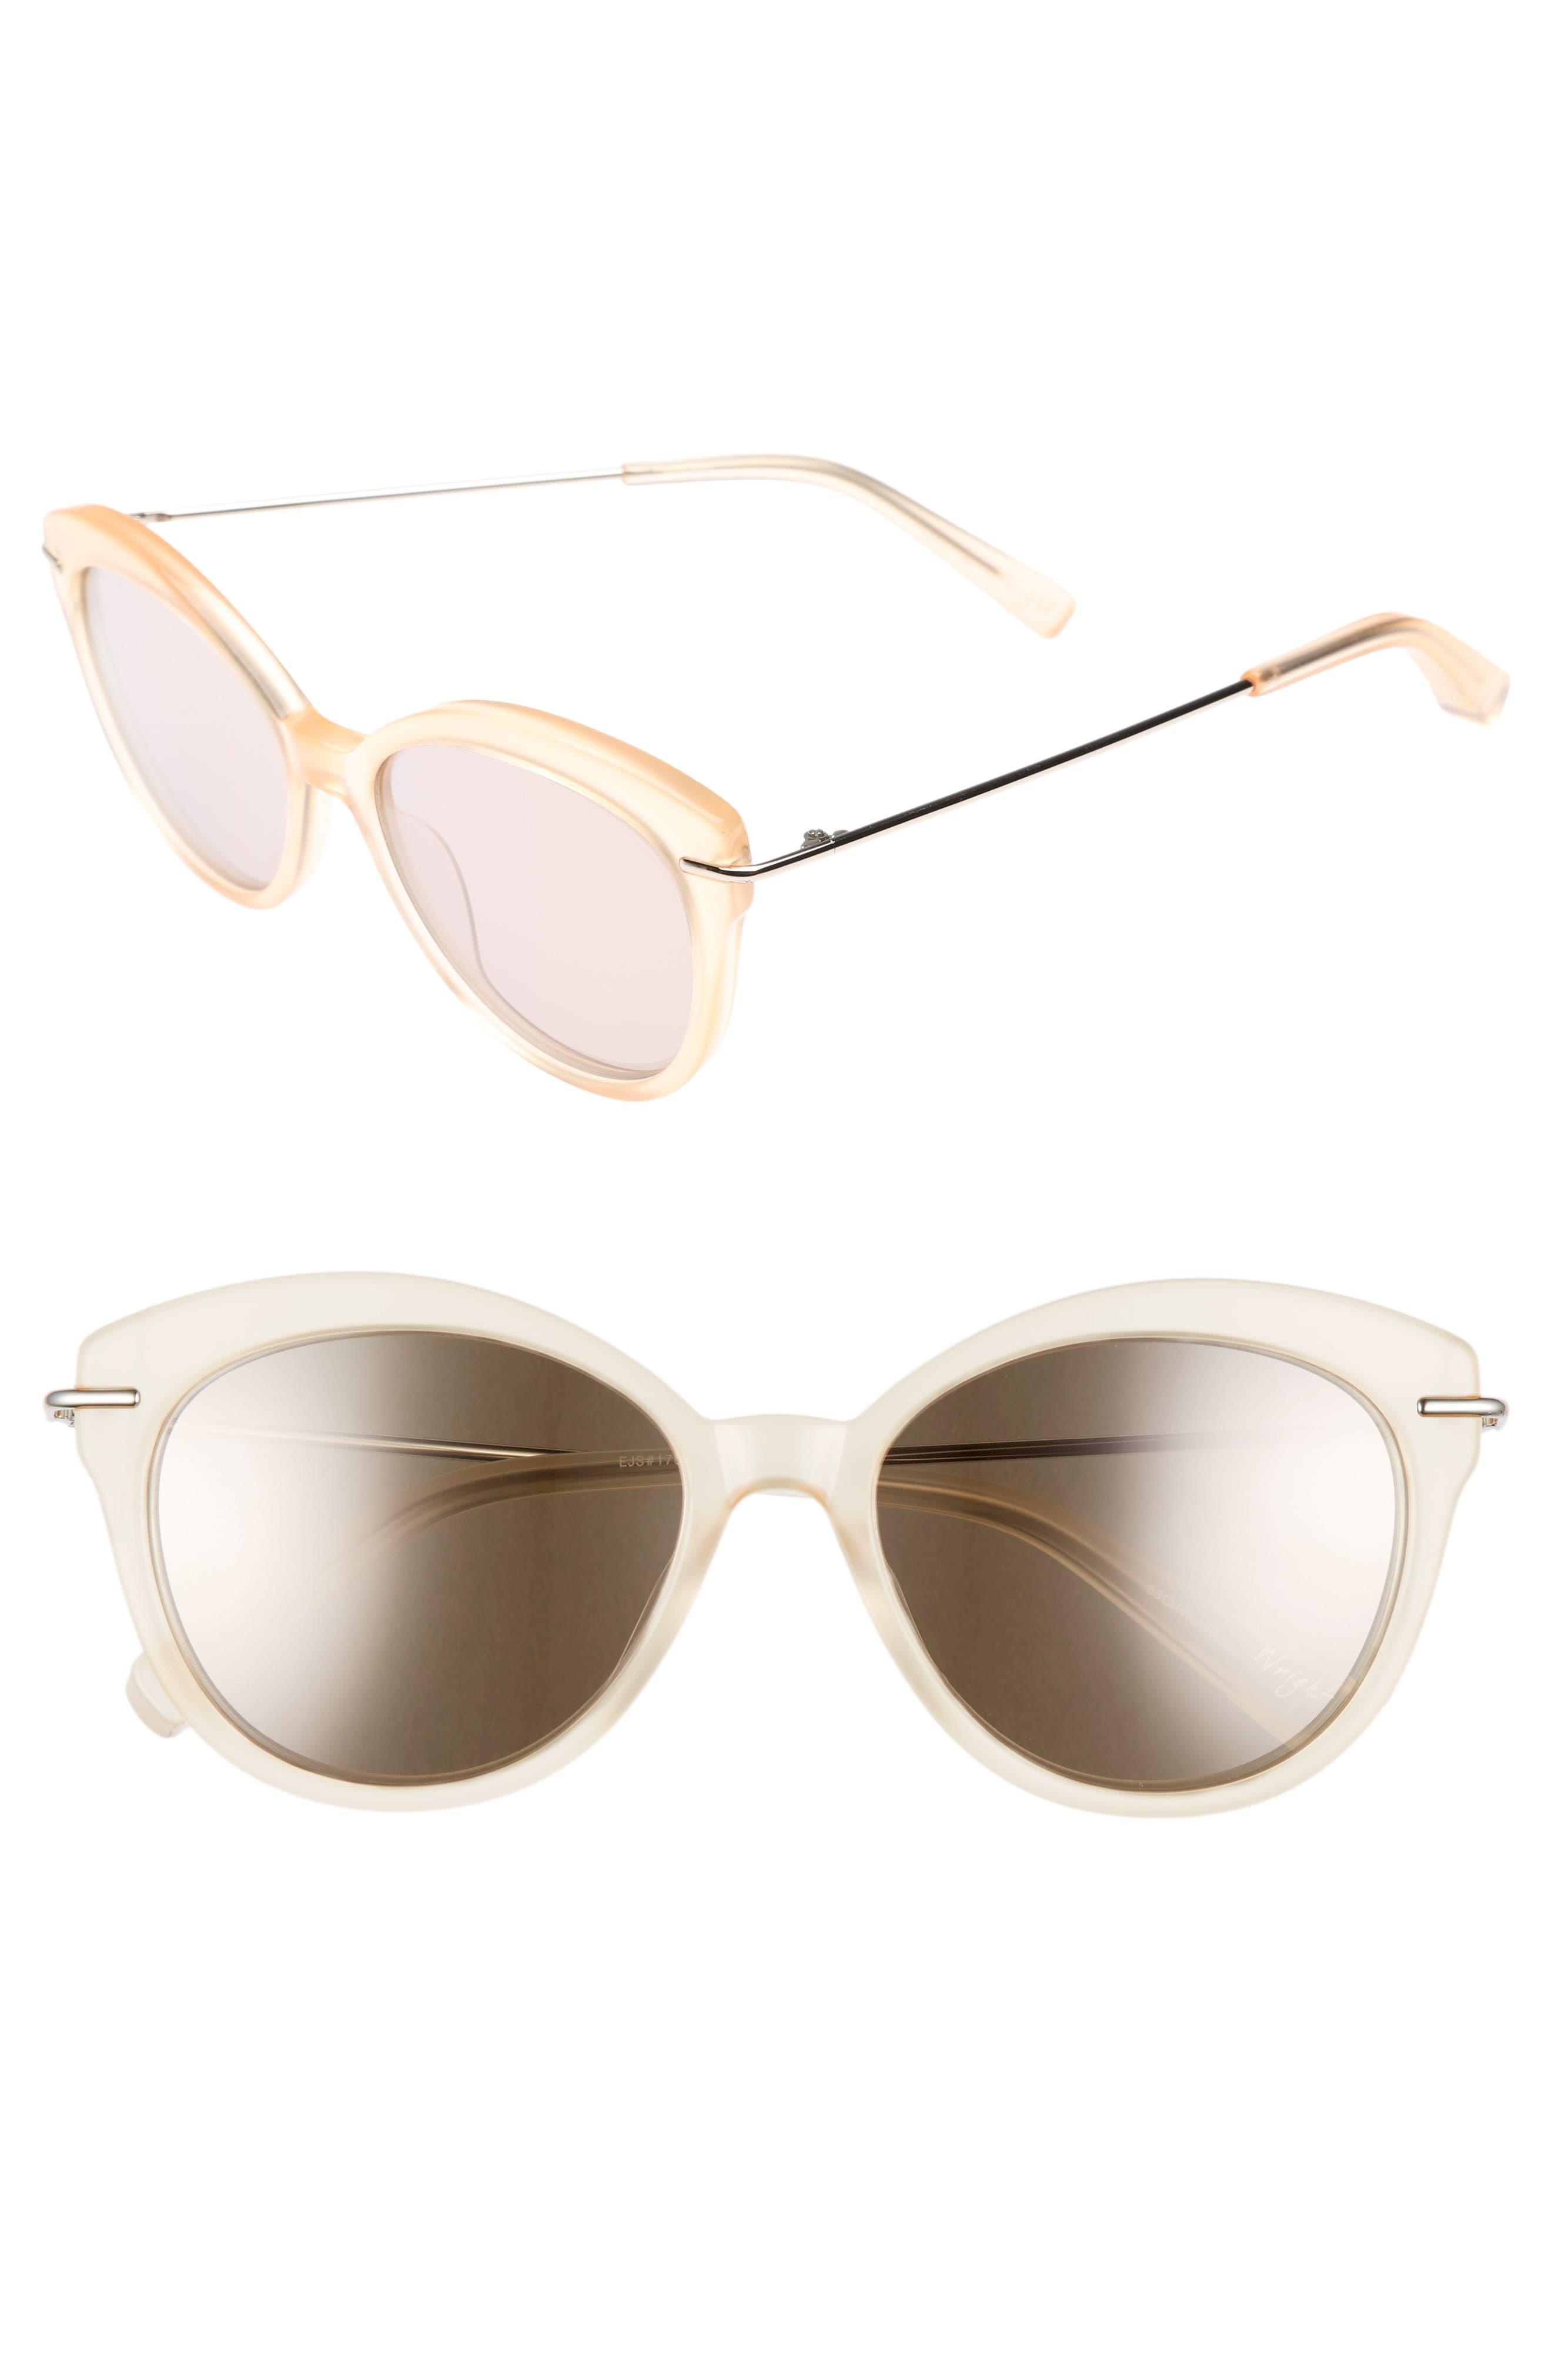 ELIZABETH AND JAMES,                             Wright 53mm Cat Eye Sunglasses,                             Main thumbnail 1, color,                             001